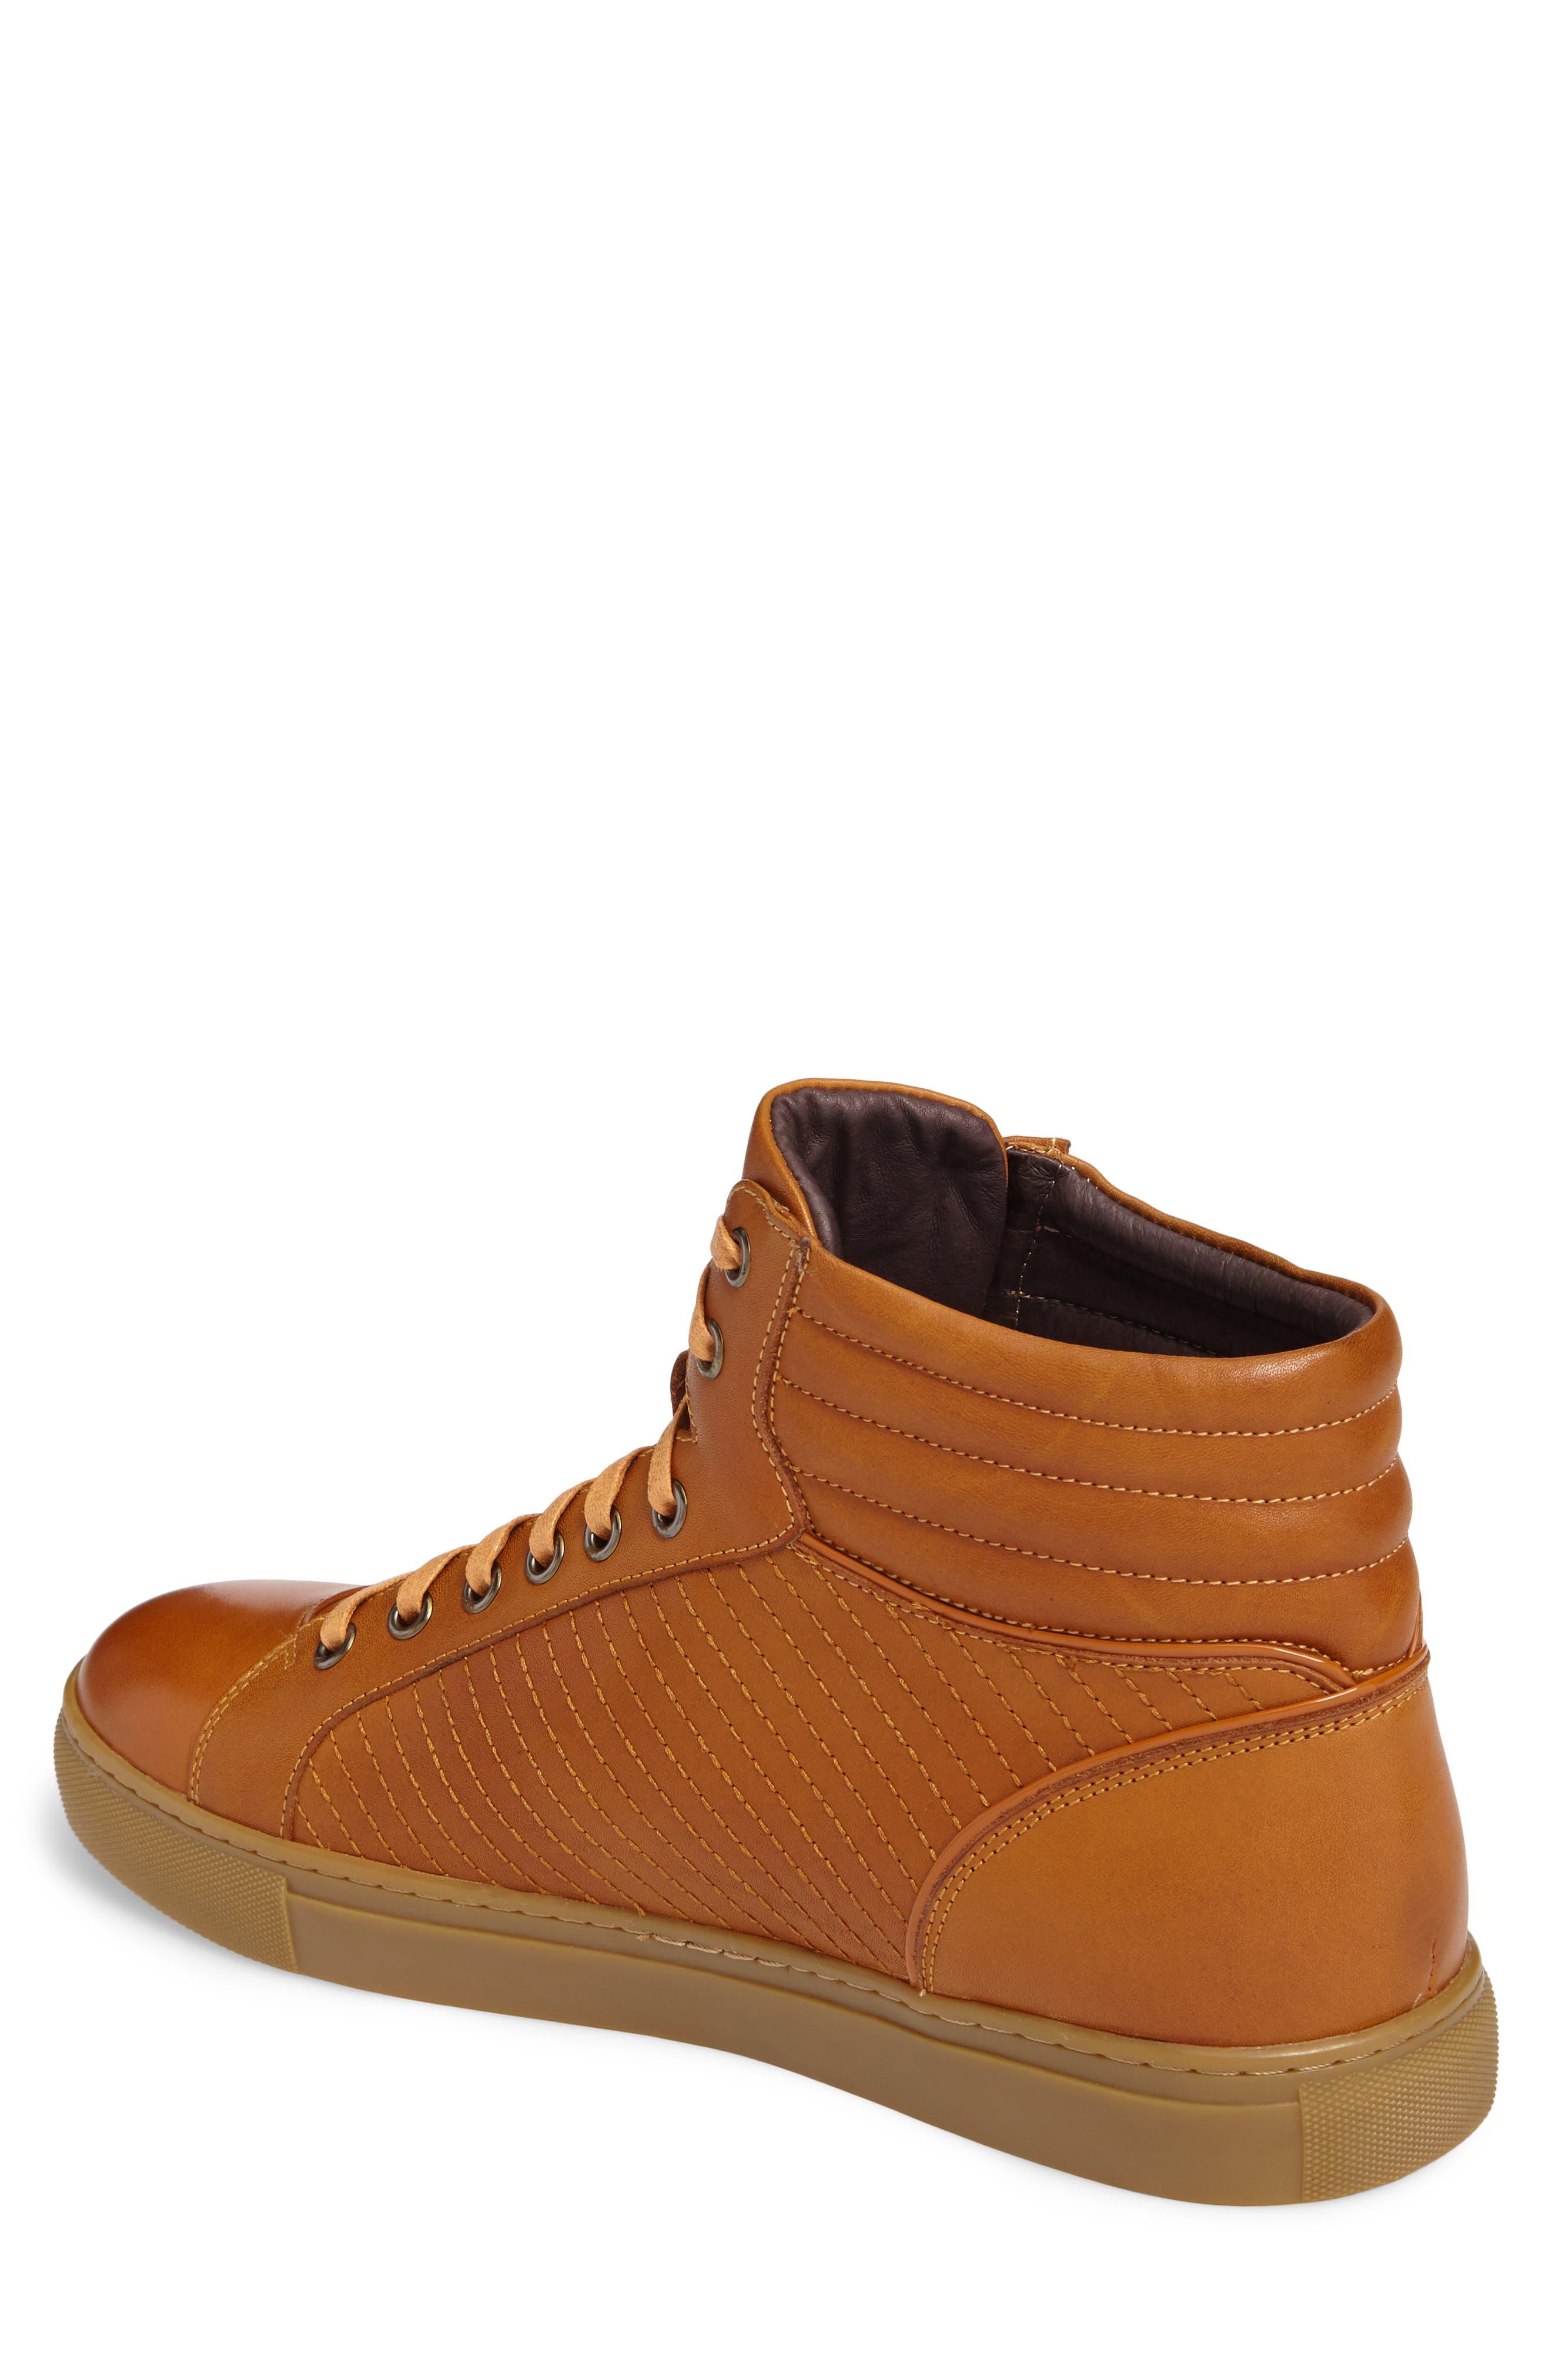 Youse Sneaker,                             Alternate thumbnail 2, color,                             Cognac Leather